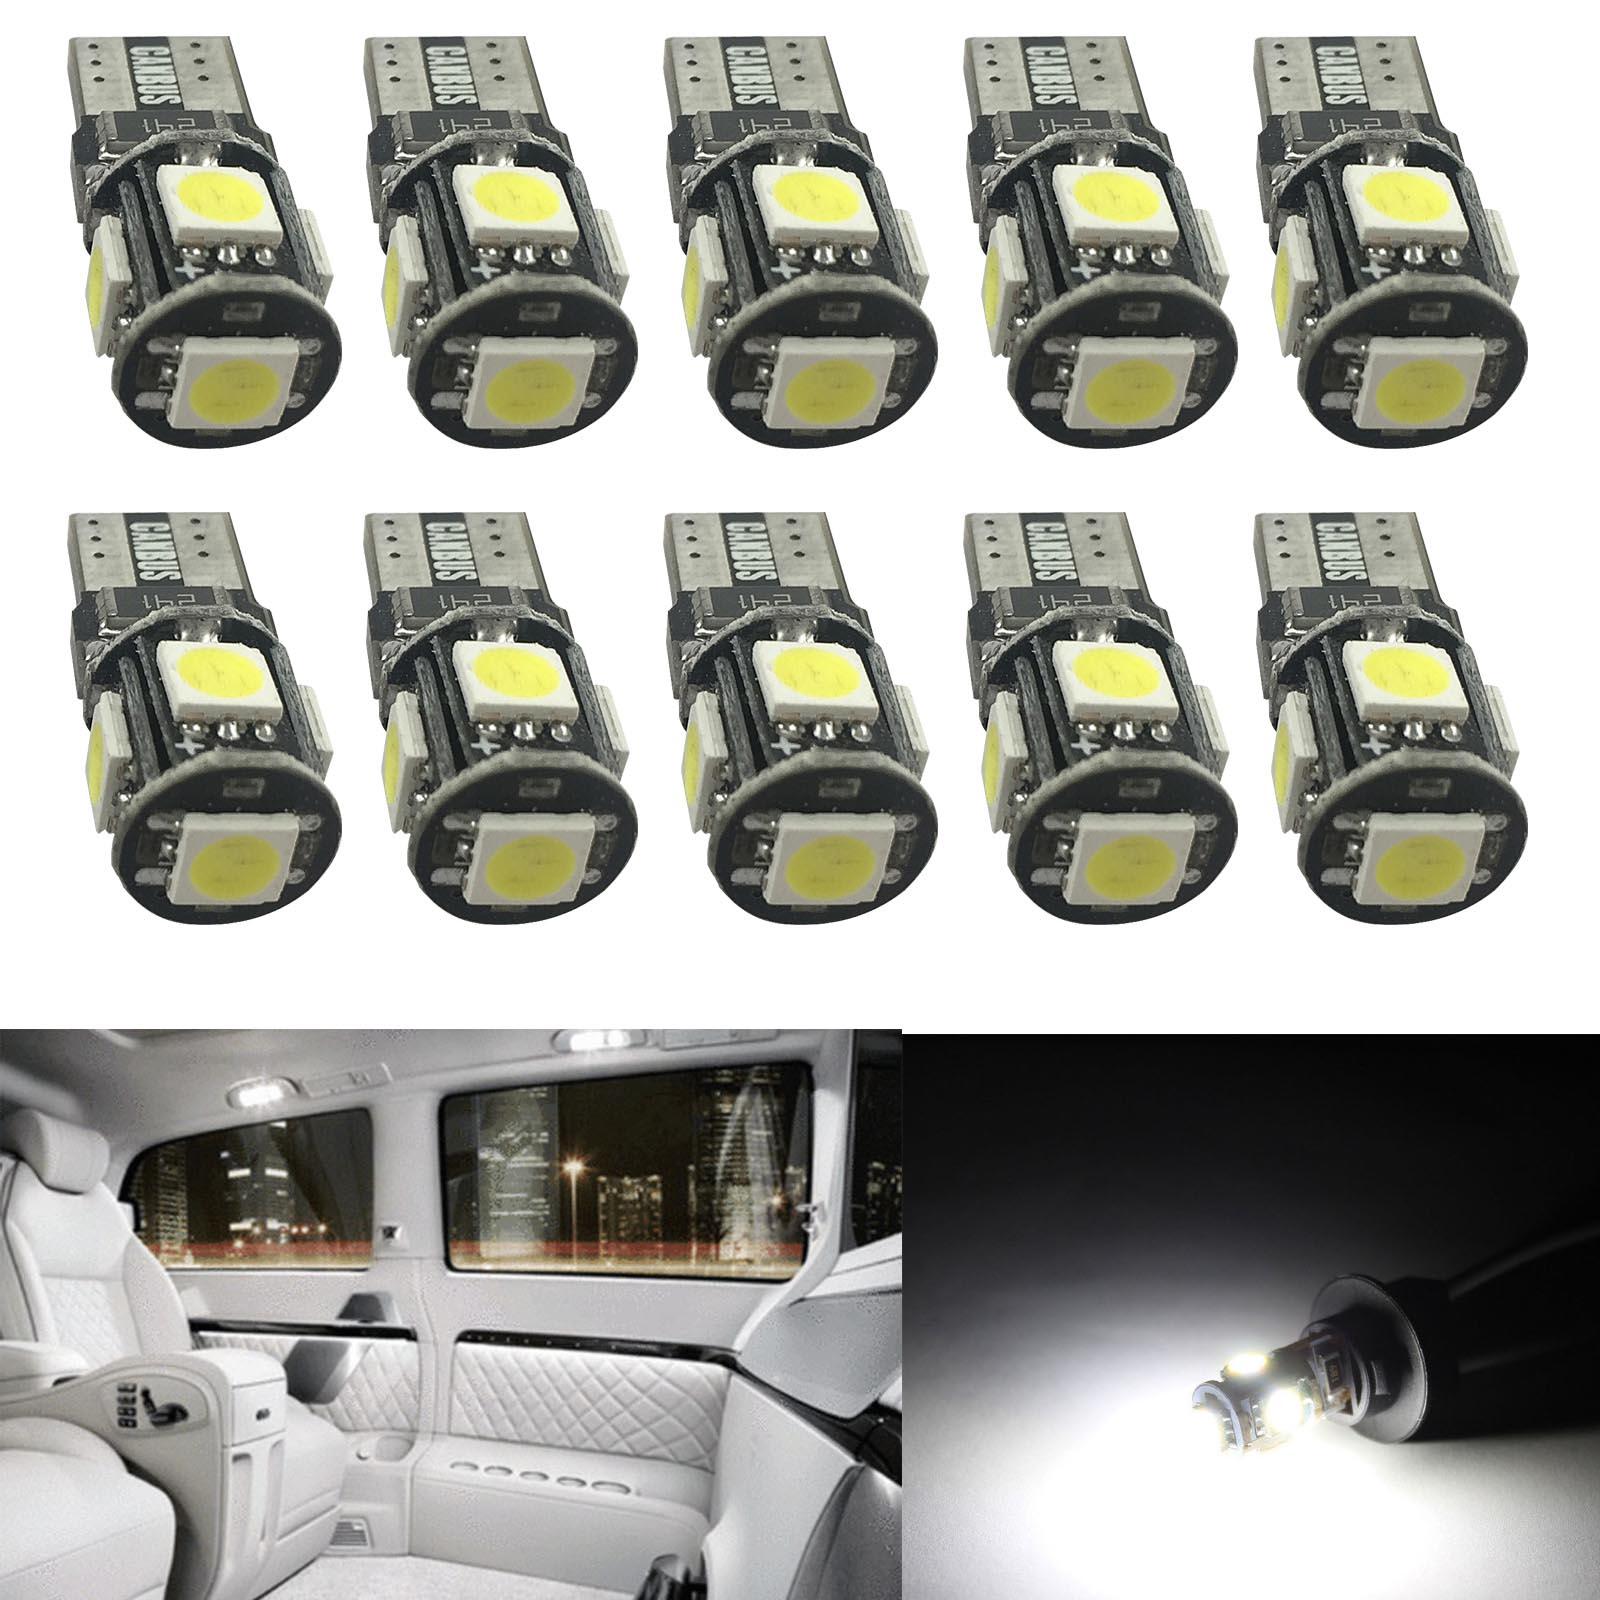 10x T10 5050 W5W 5 SMD 194 168 LED White Car Side Wedge Tail Light Lamp Bulb 12V